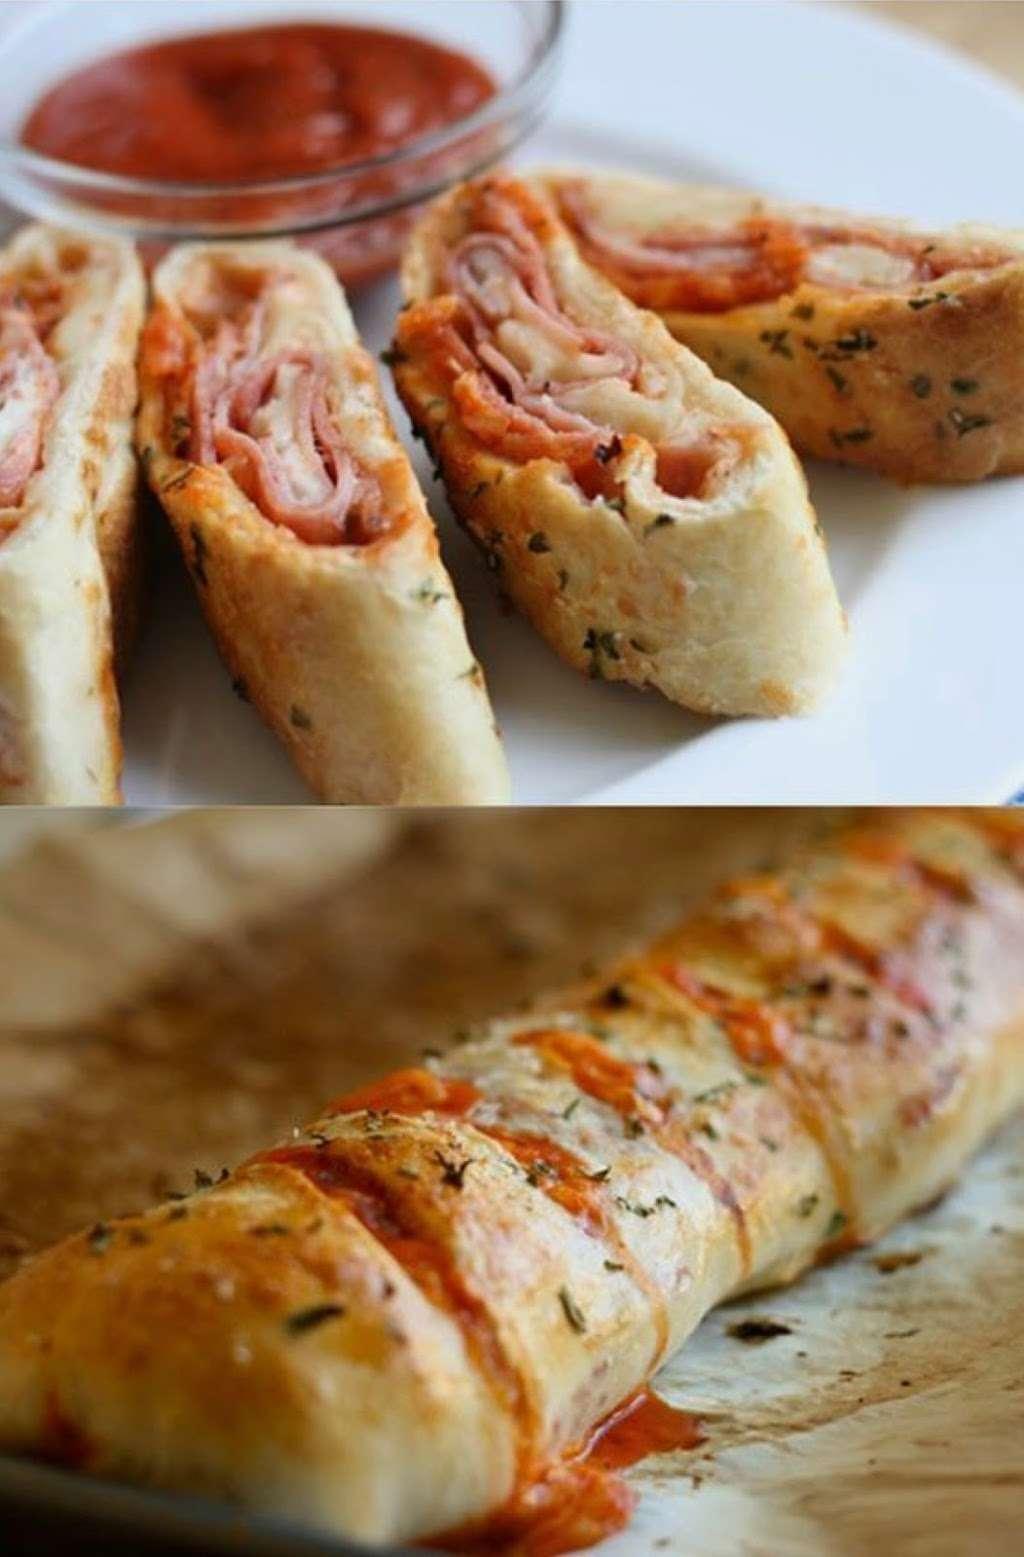 Francos Market Deli & Pizzeria - meal delivery  | Photo 5 of 10 | Address: 1346 NJ-77, Bridgeton, NJ 08302, USA | Phone: (856) 451-2920